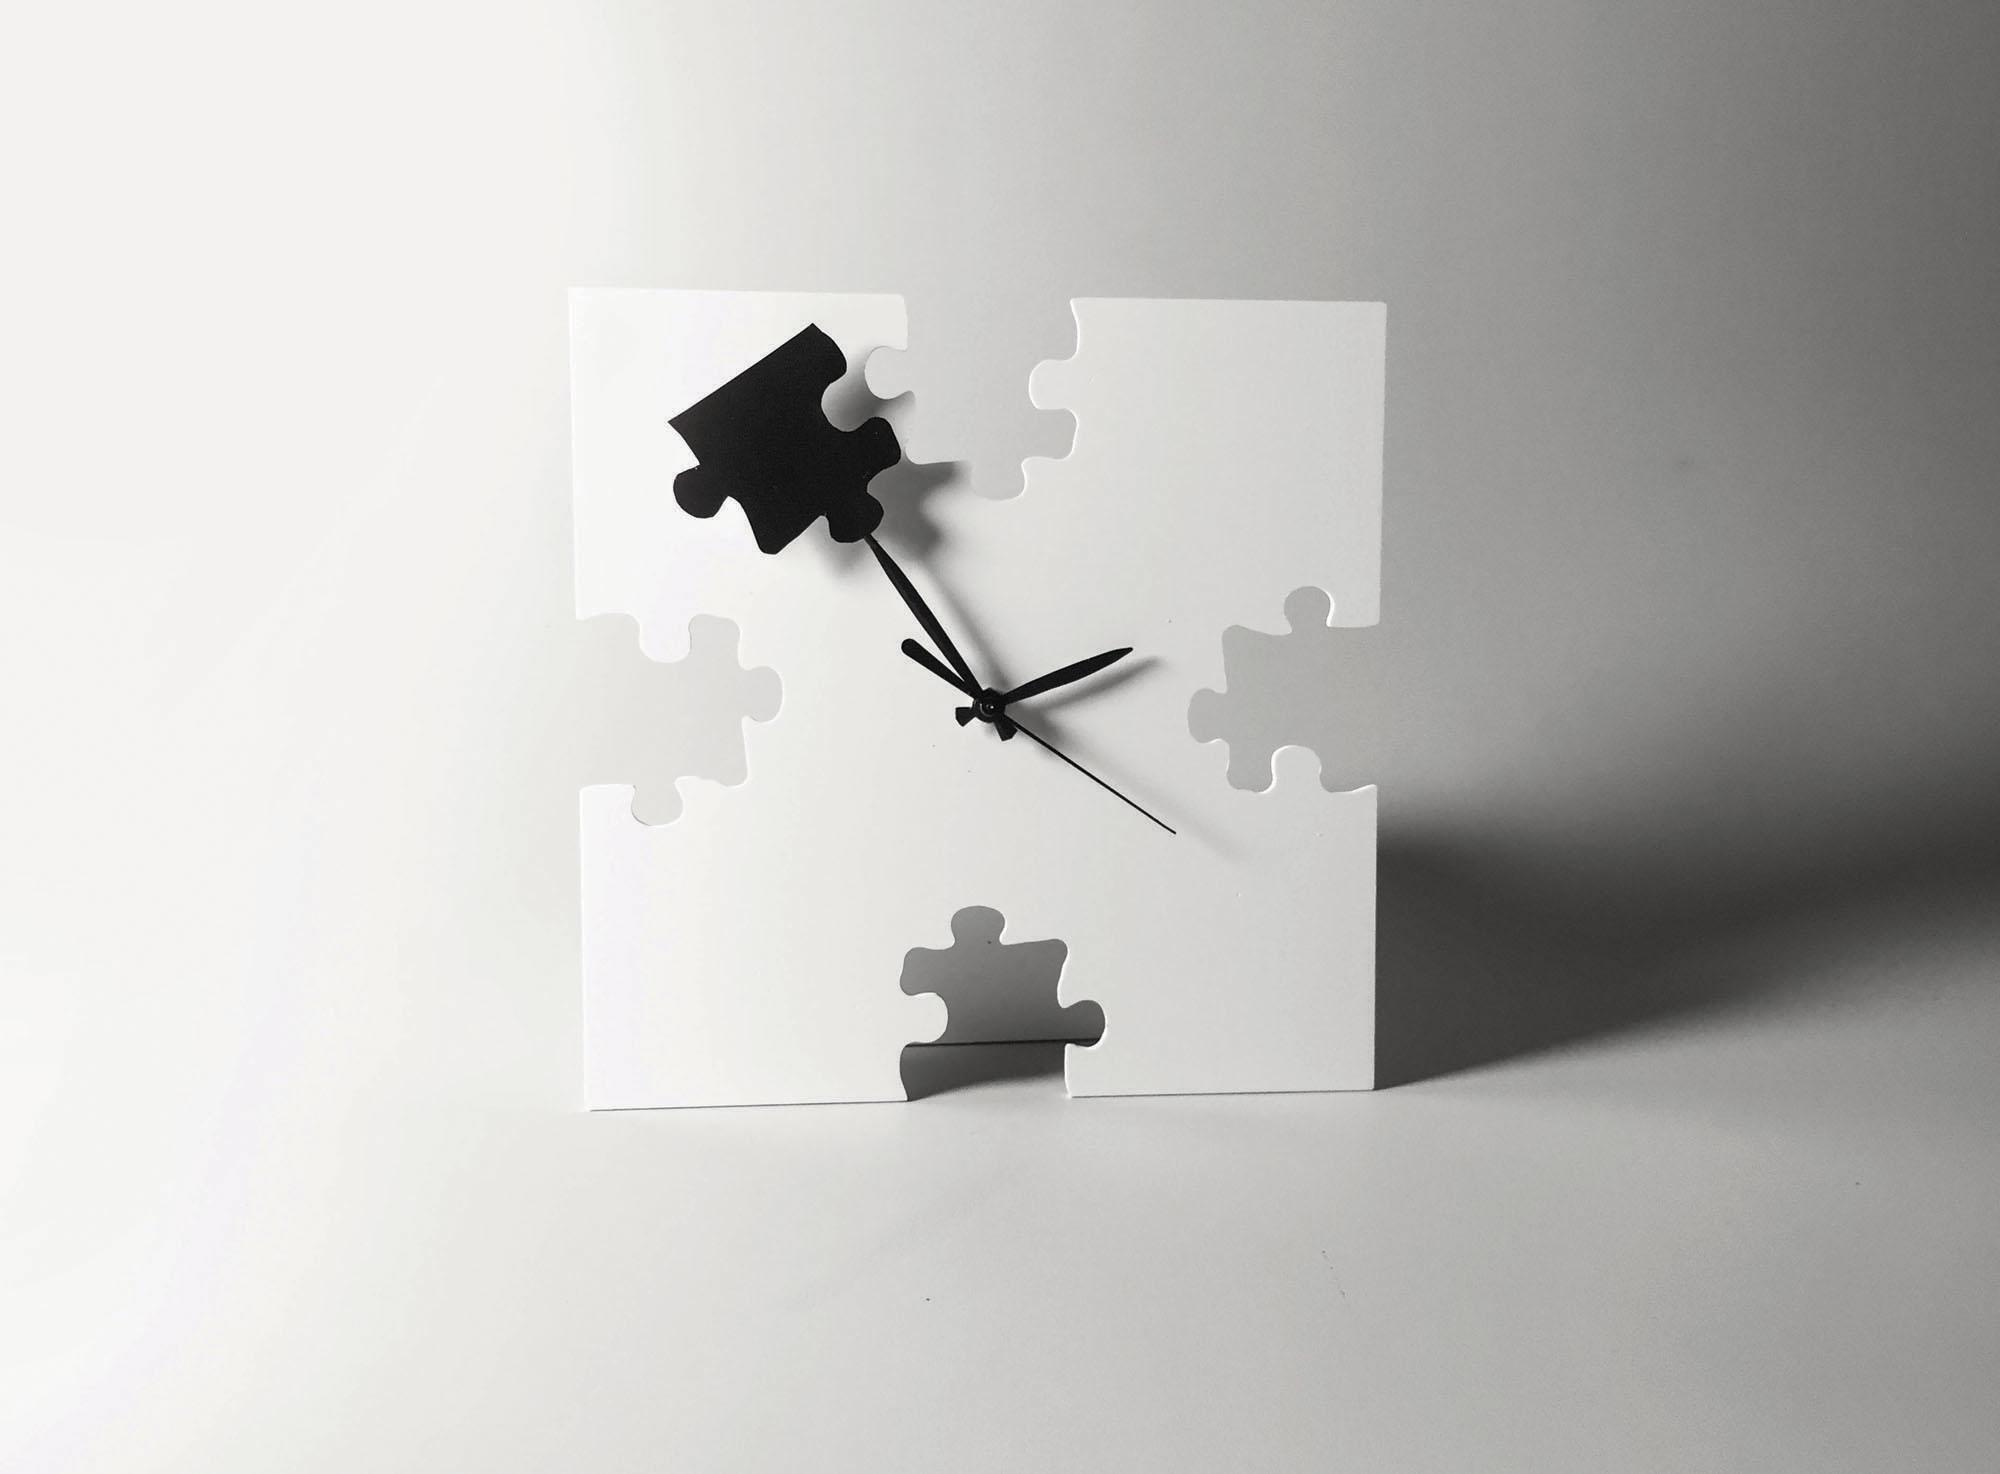 LisaHa-PuzzleClock-1 - Lisa Ha.jpg